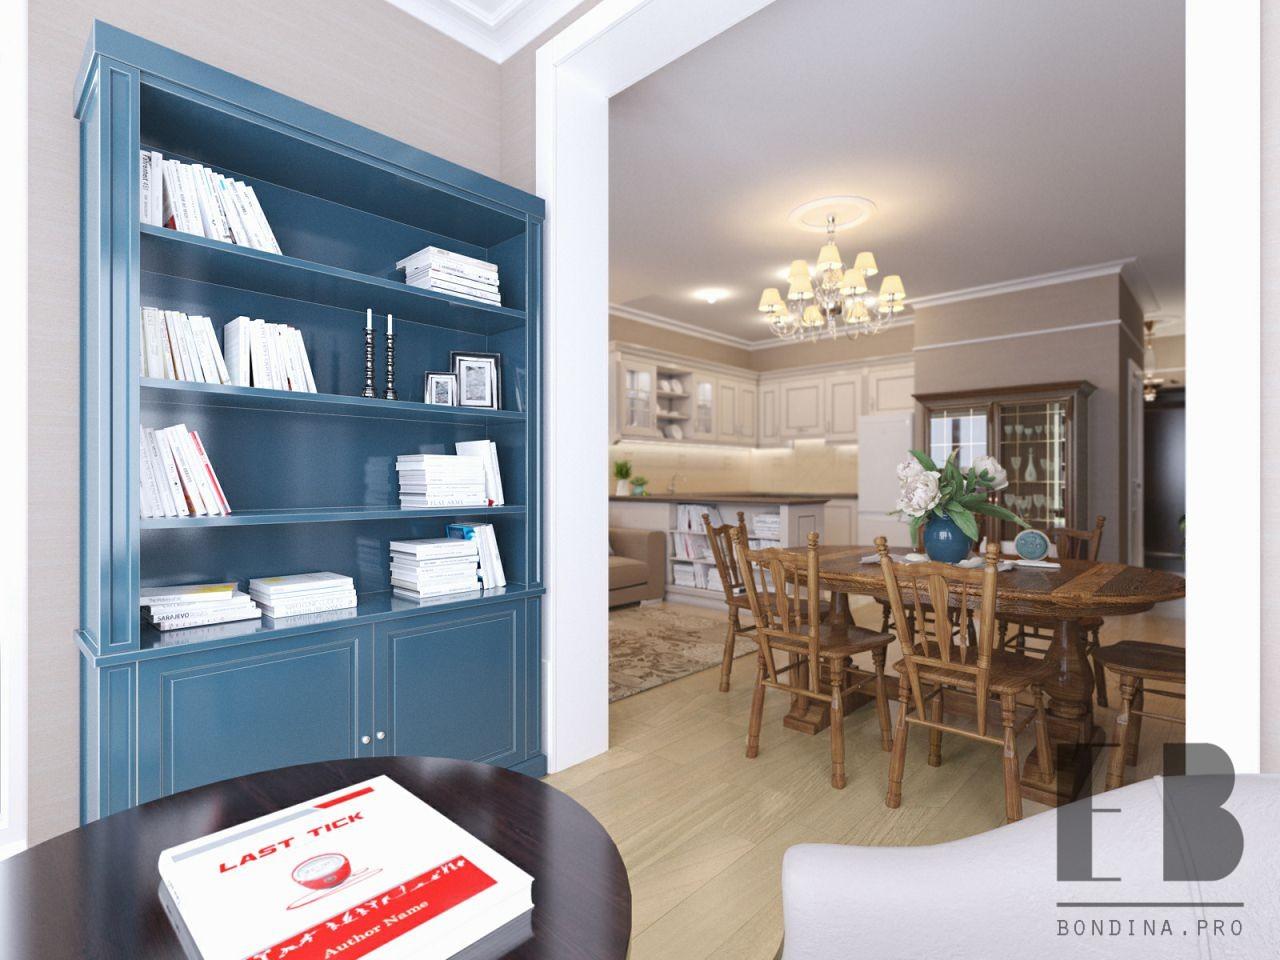 Blue Bookcase in the Living Room - Interior Design Ideas